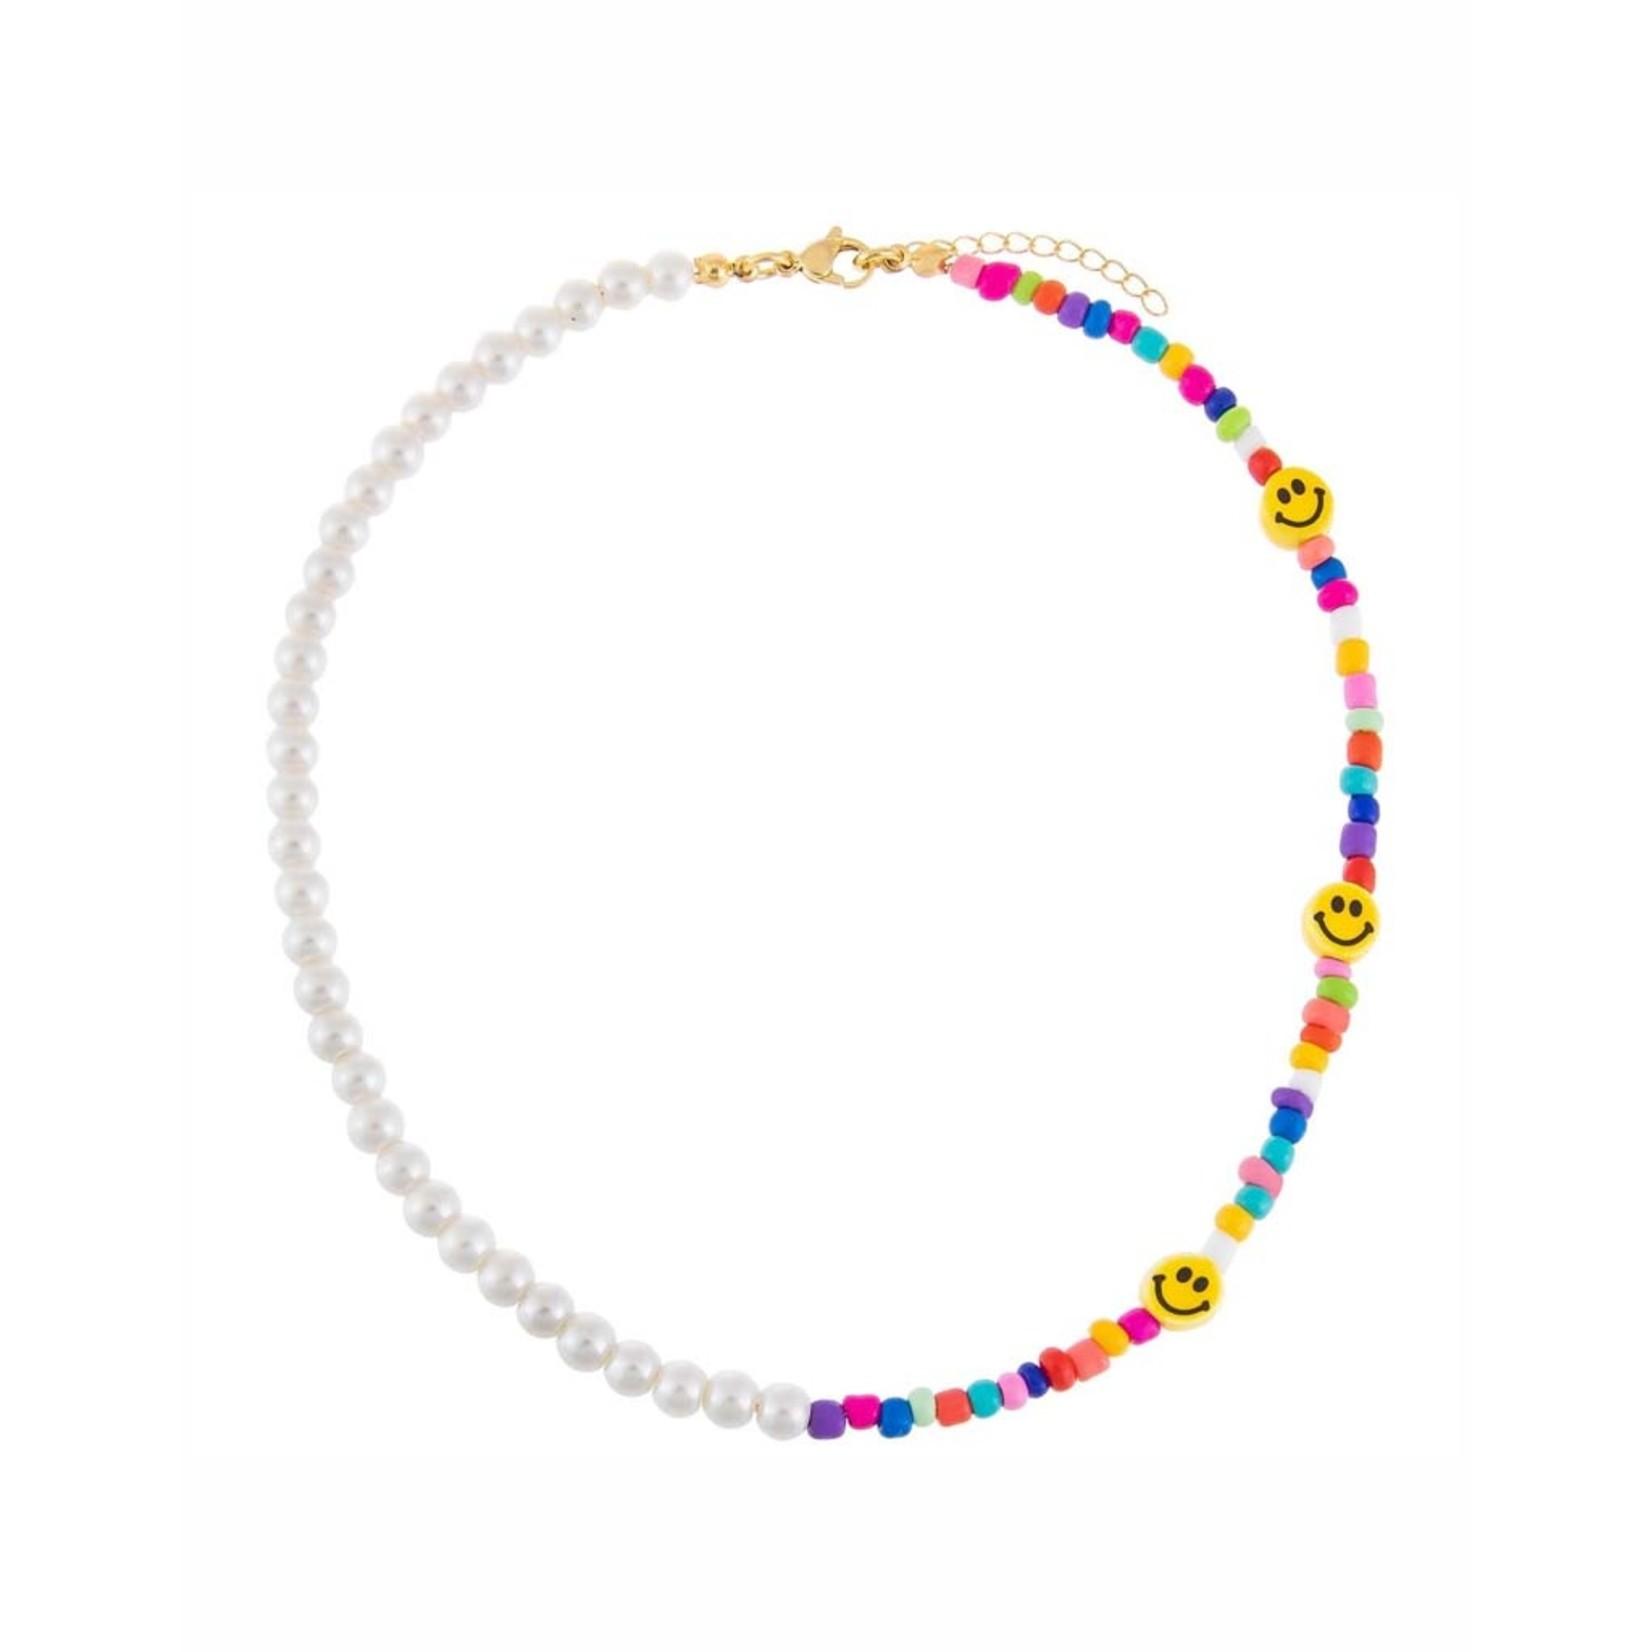 Adinas Smiley Face X Pearl Necklace